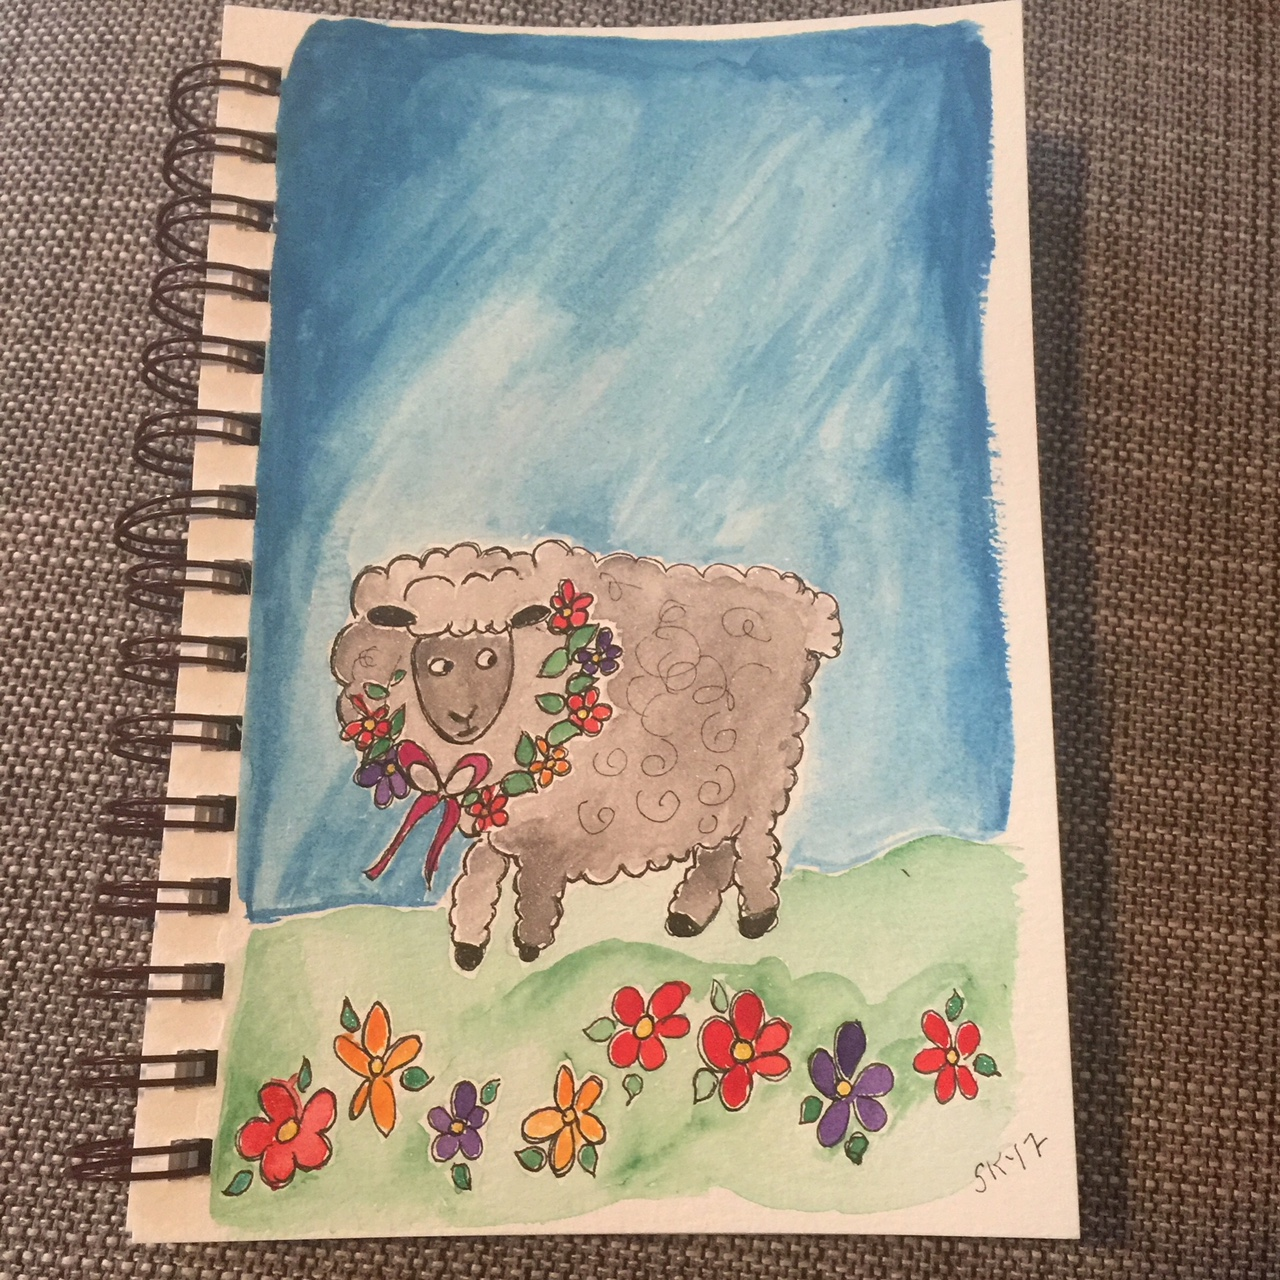 ewe-look-pretty